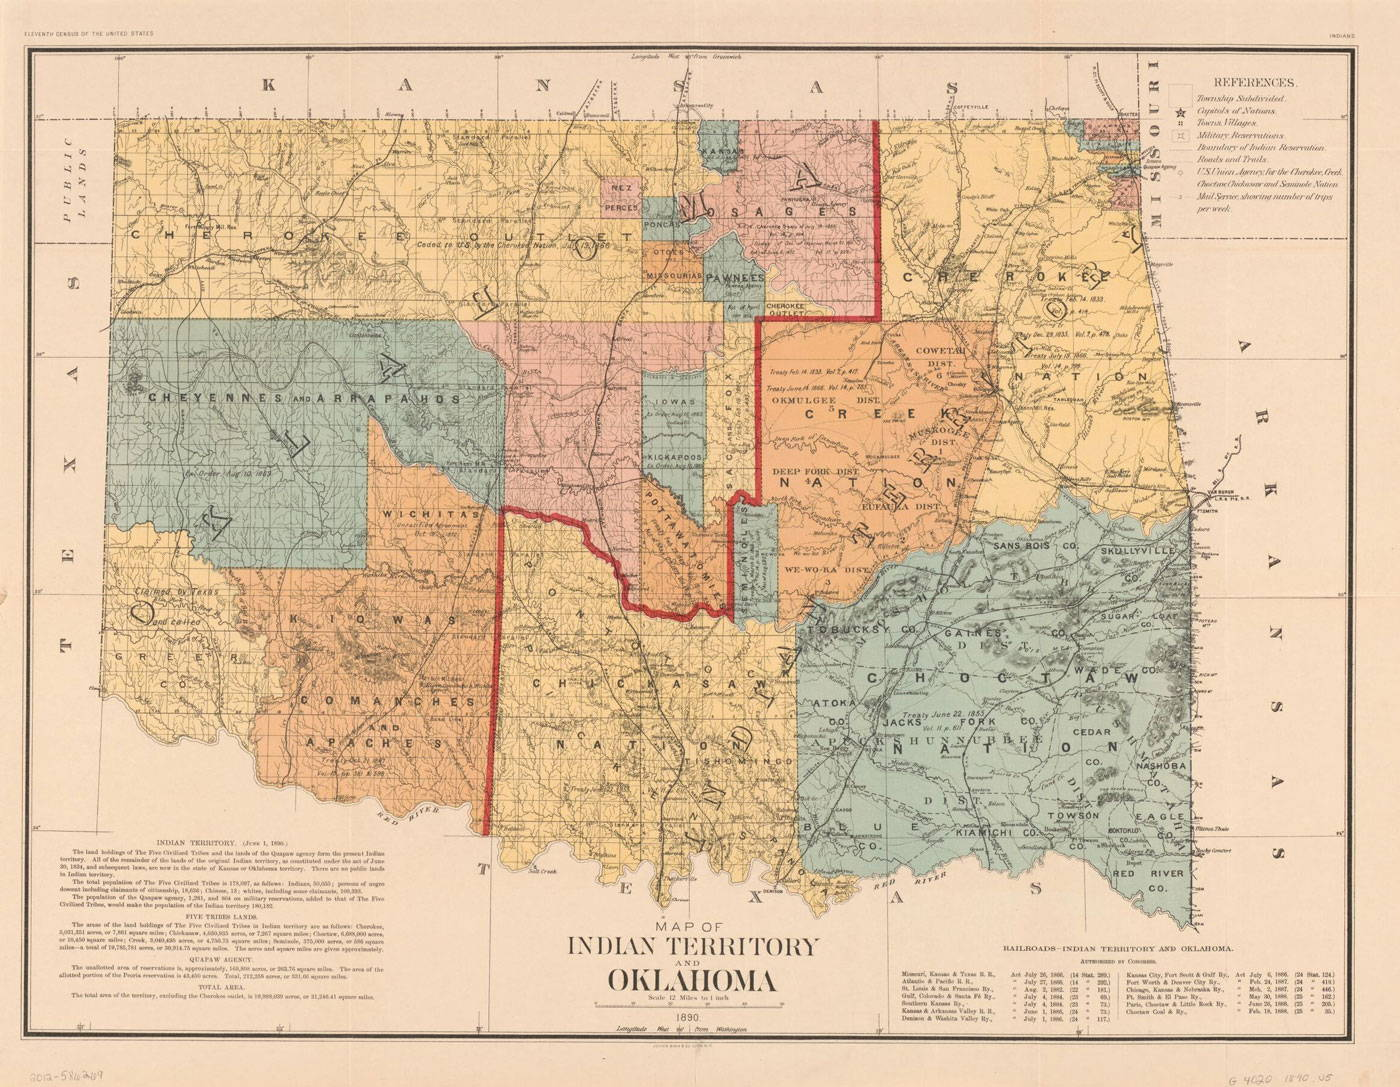 Map of the Oklahoma Territory